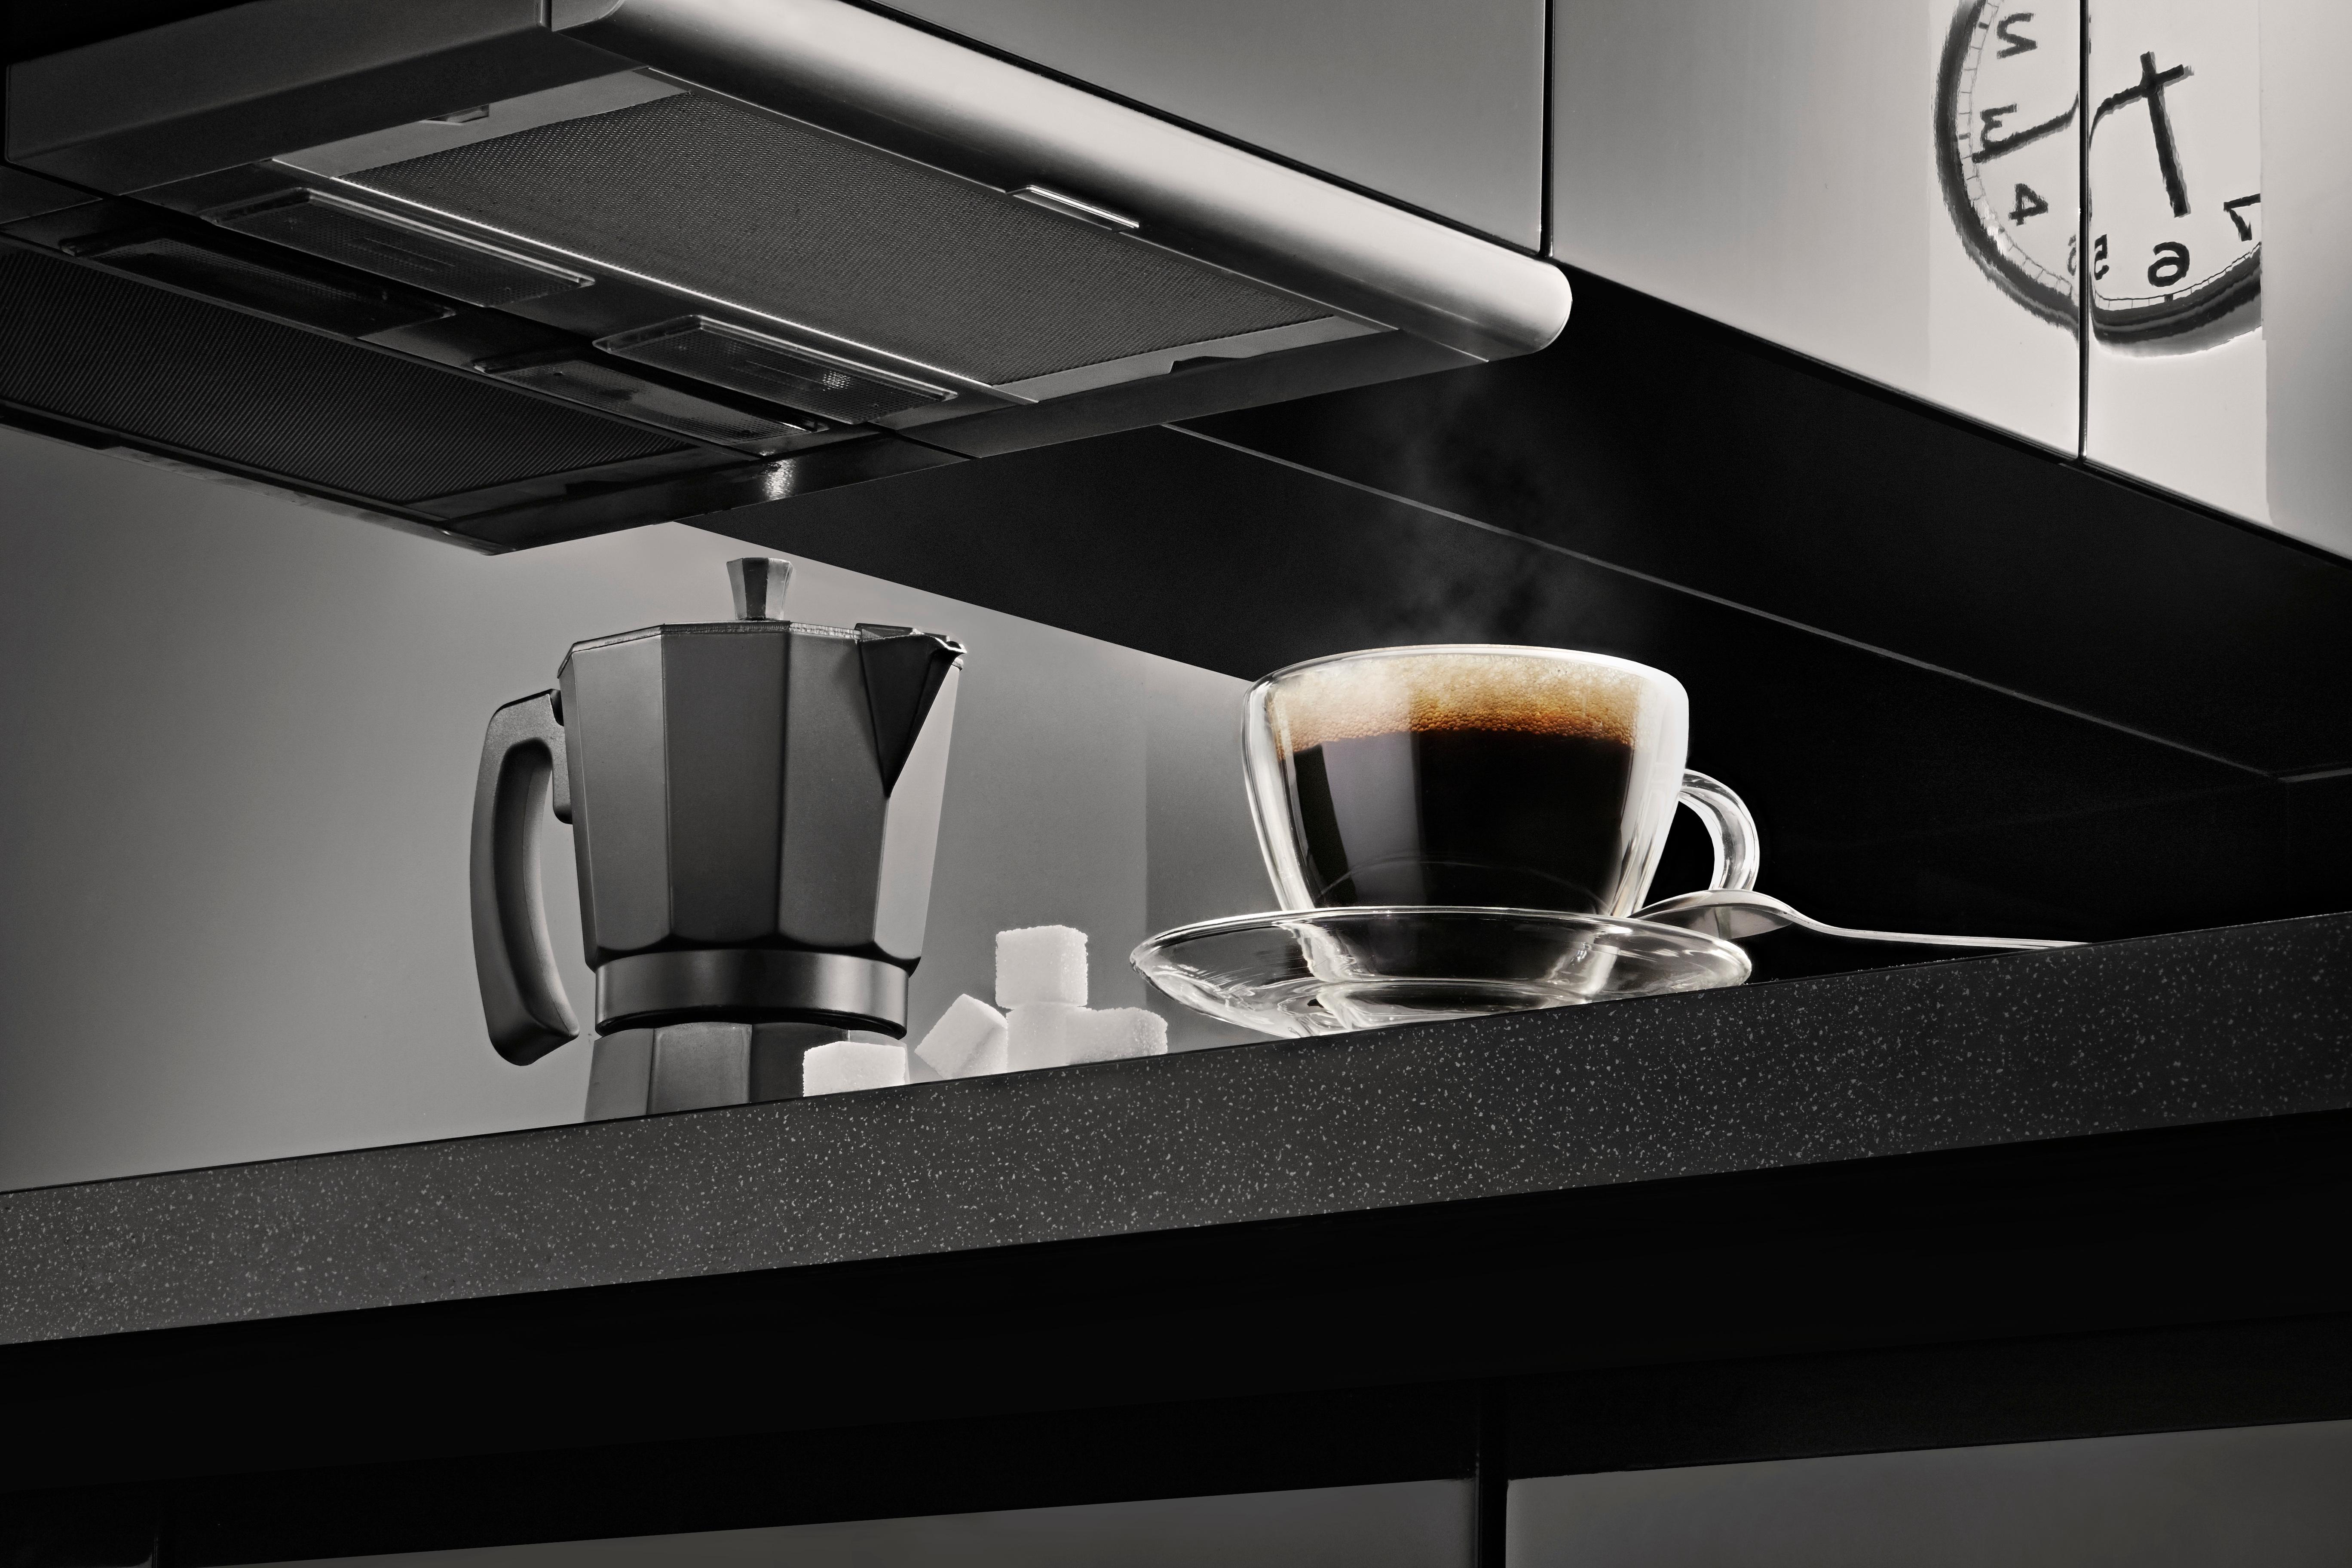 Fotos gratis : café, vapor, reloj, cocina, lavabo, negro, habitación ...